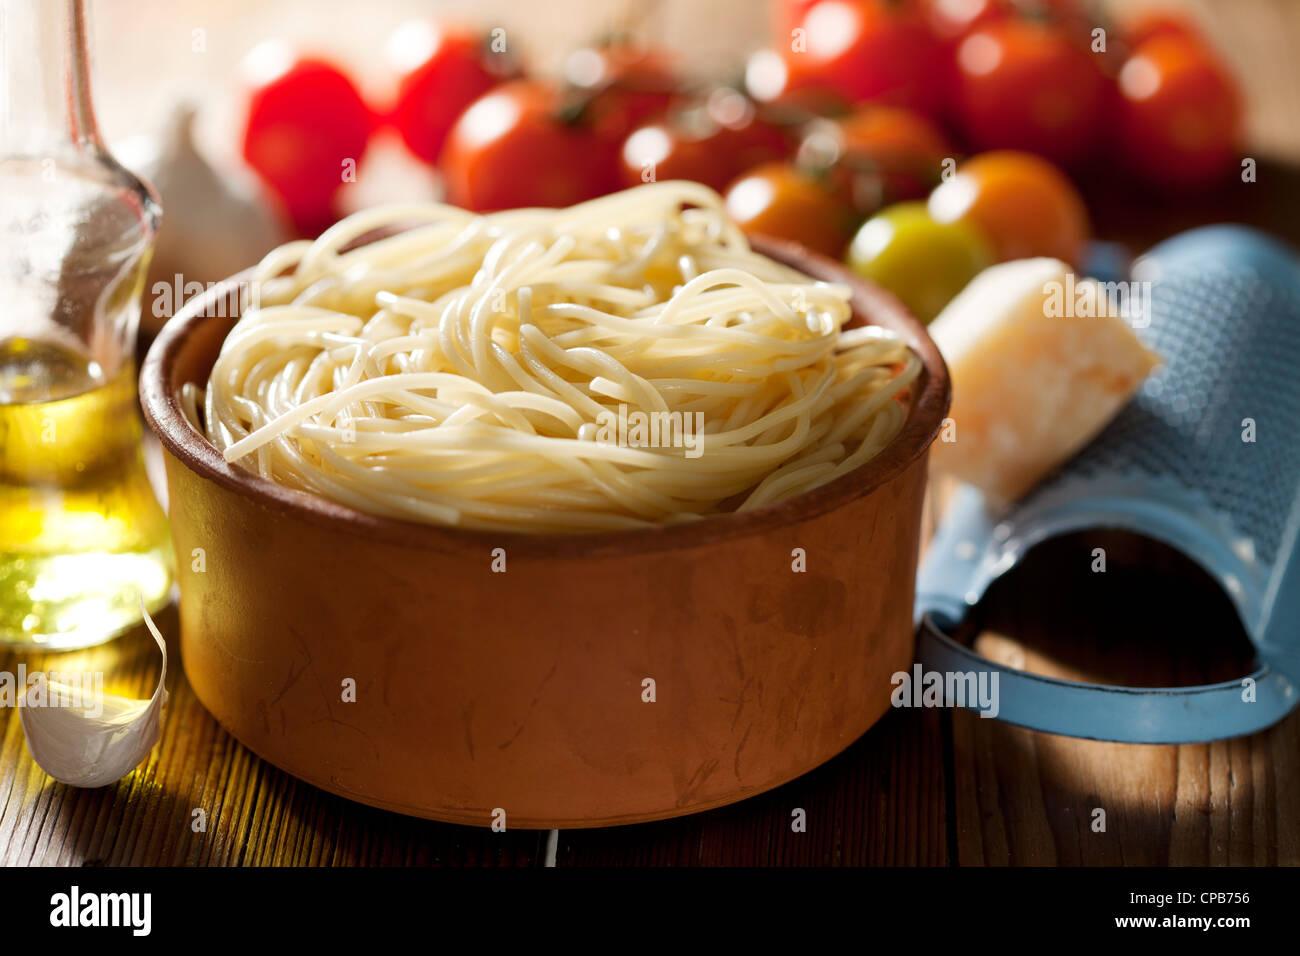 pâtes alimentaires Photo Stock